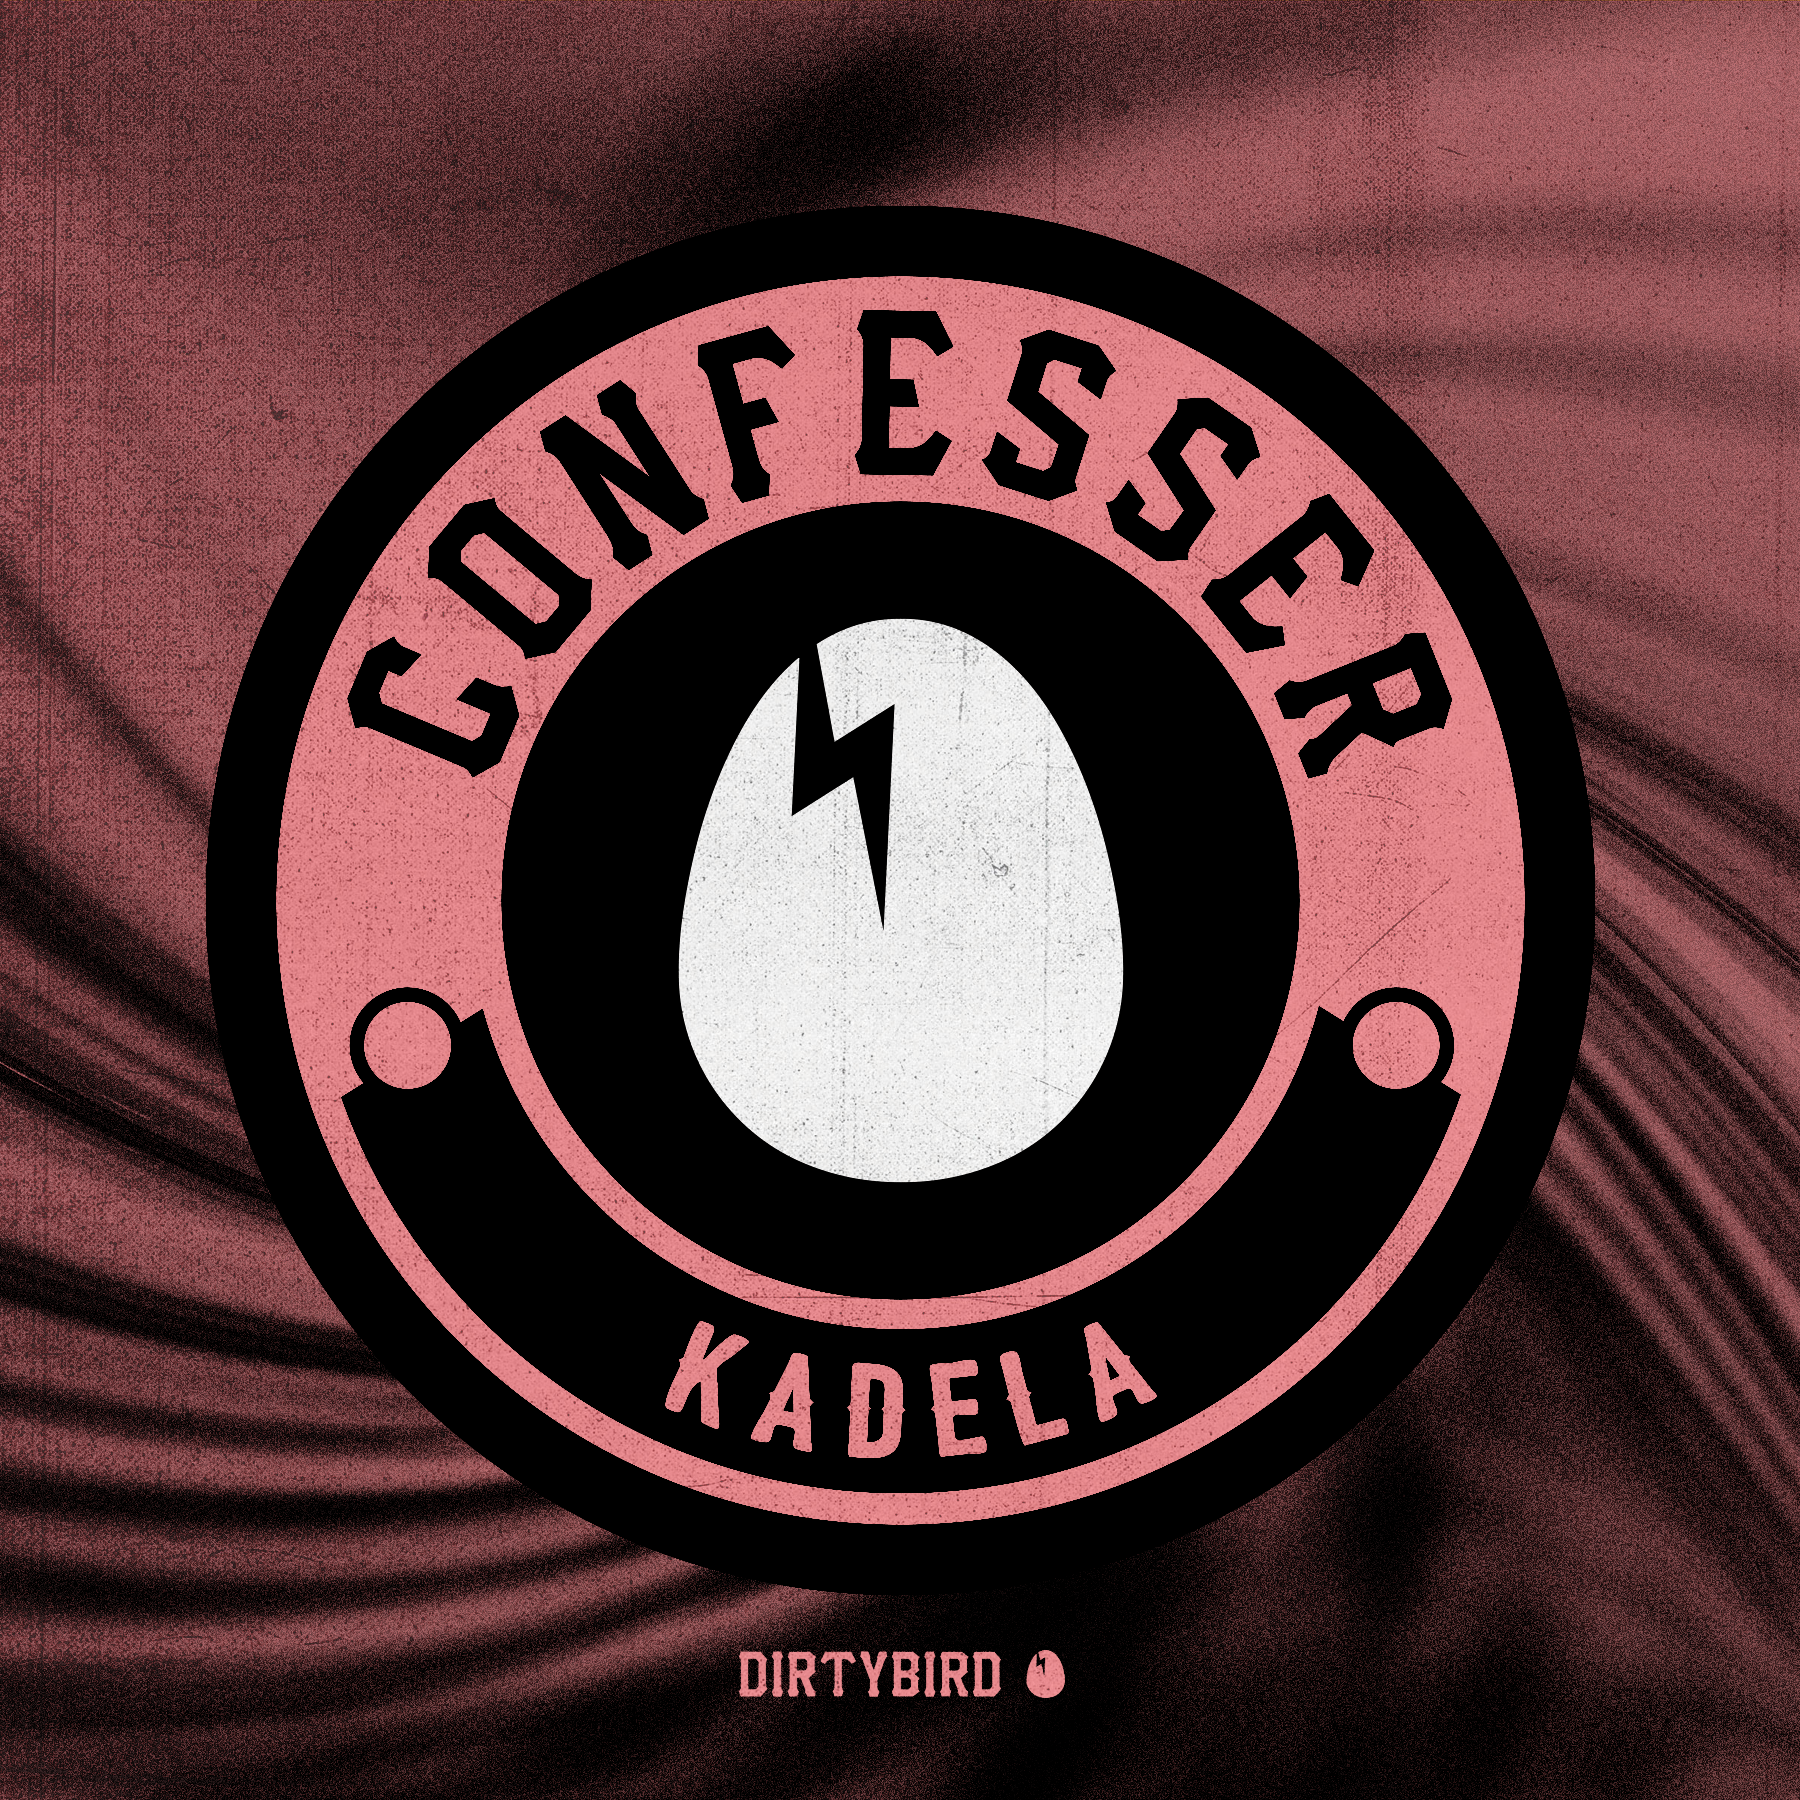 Birdfeed confesser kadela